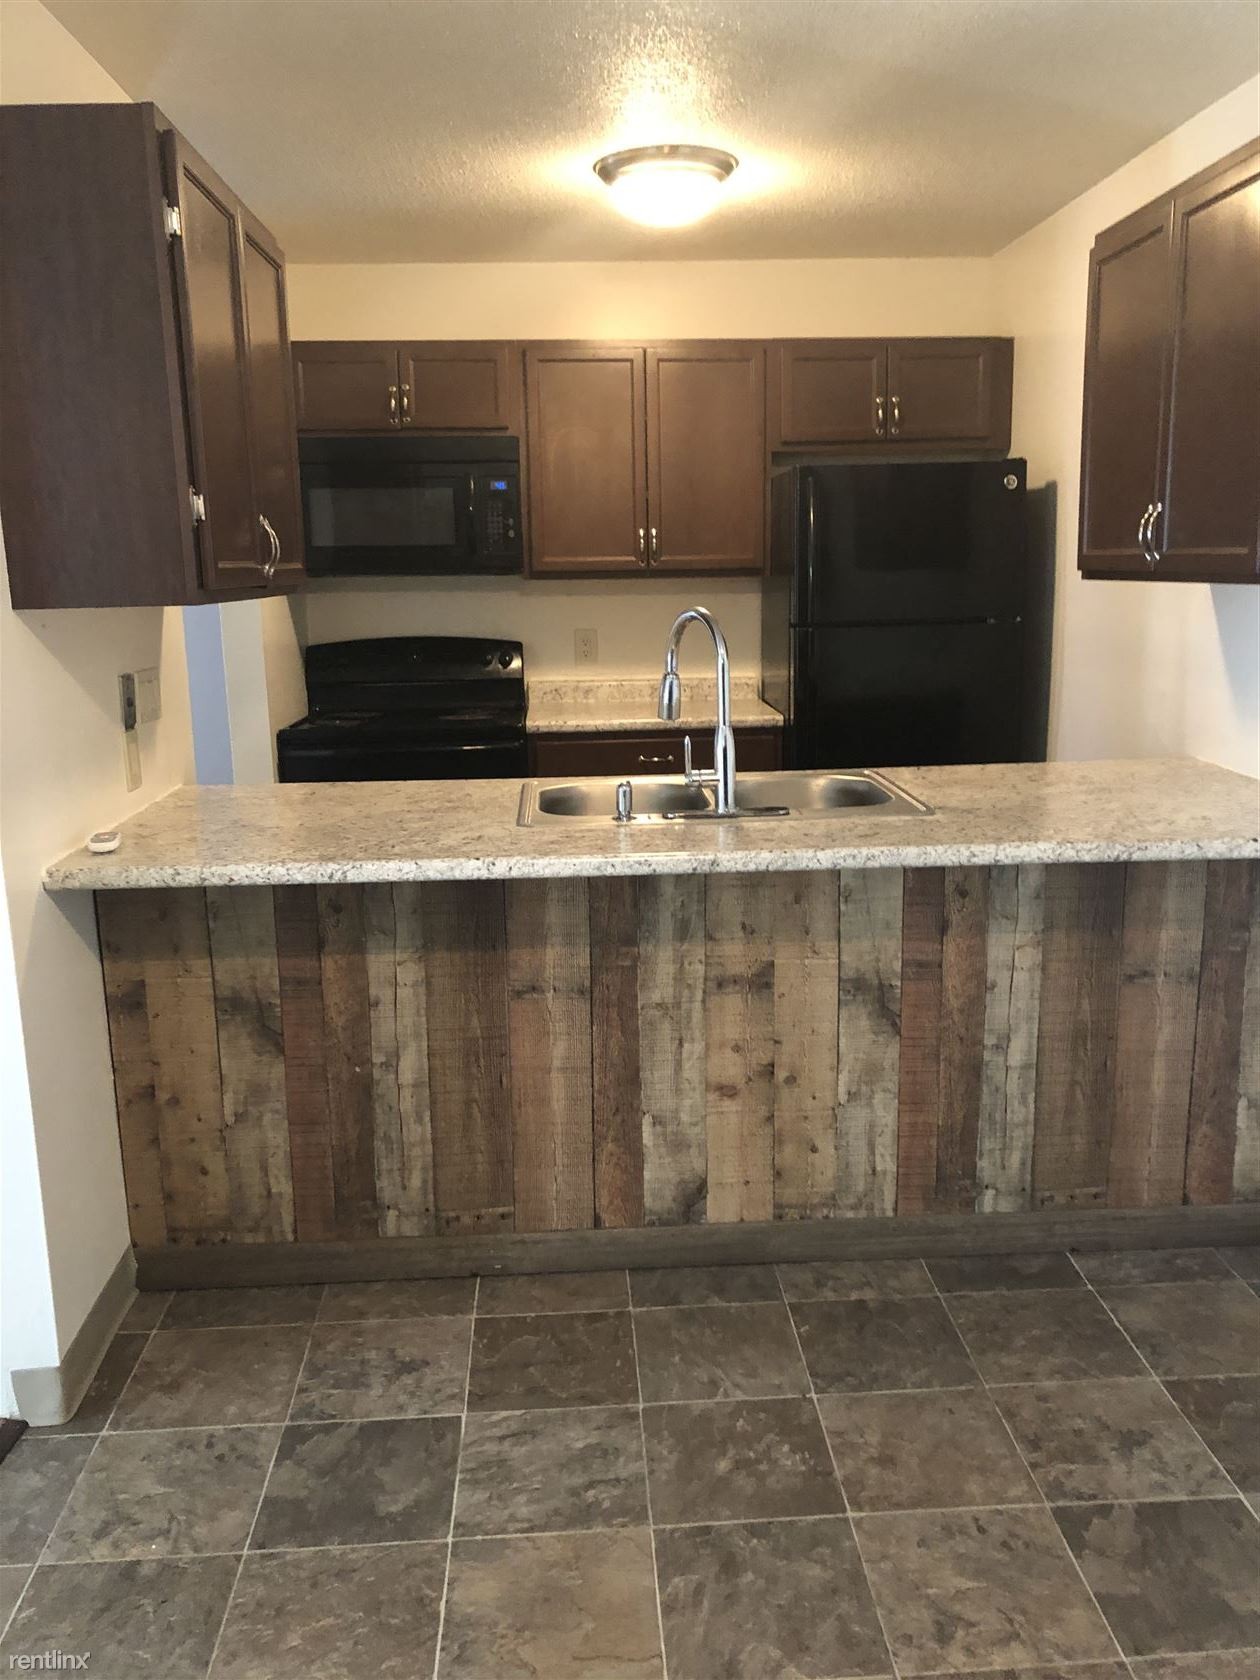 69086 Texas Ave, Sturgis, MI - $470 USD/ month